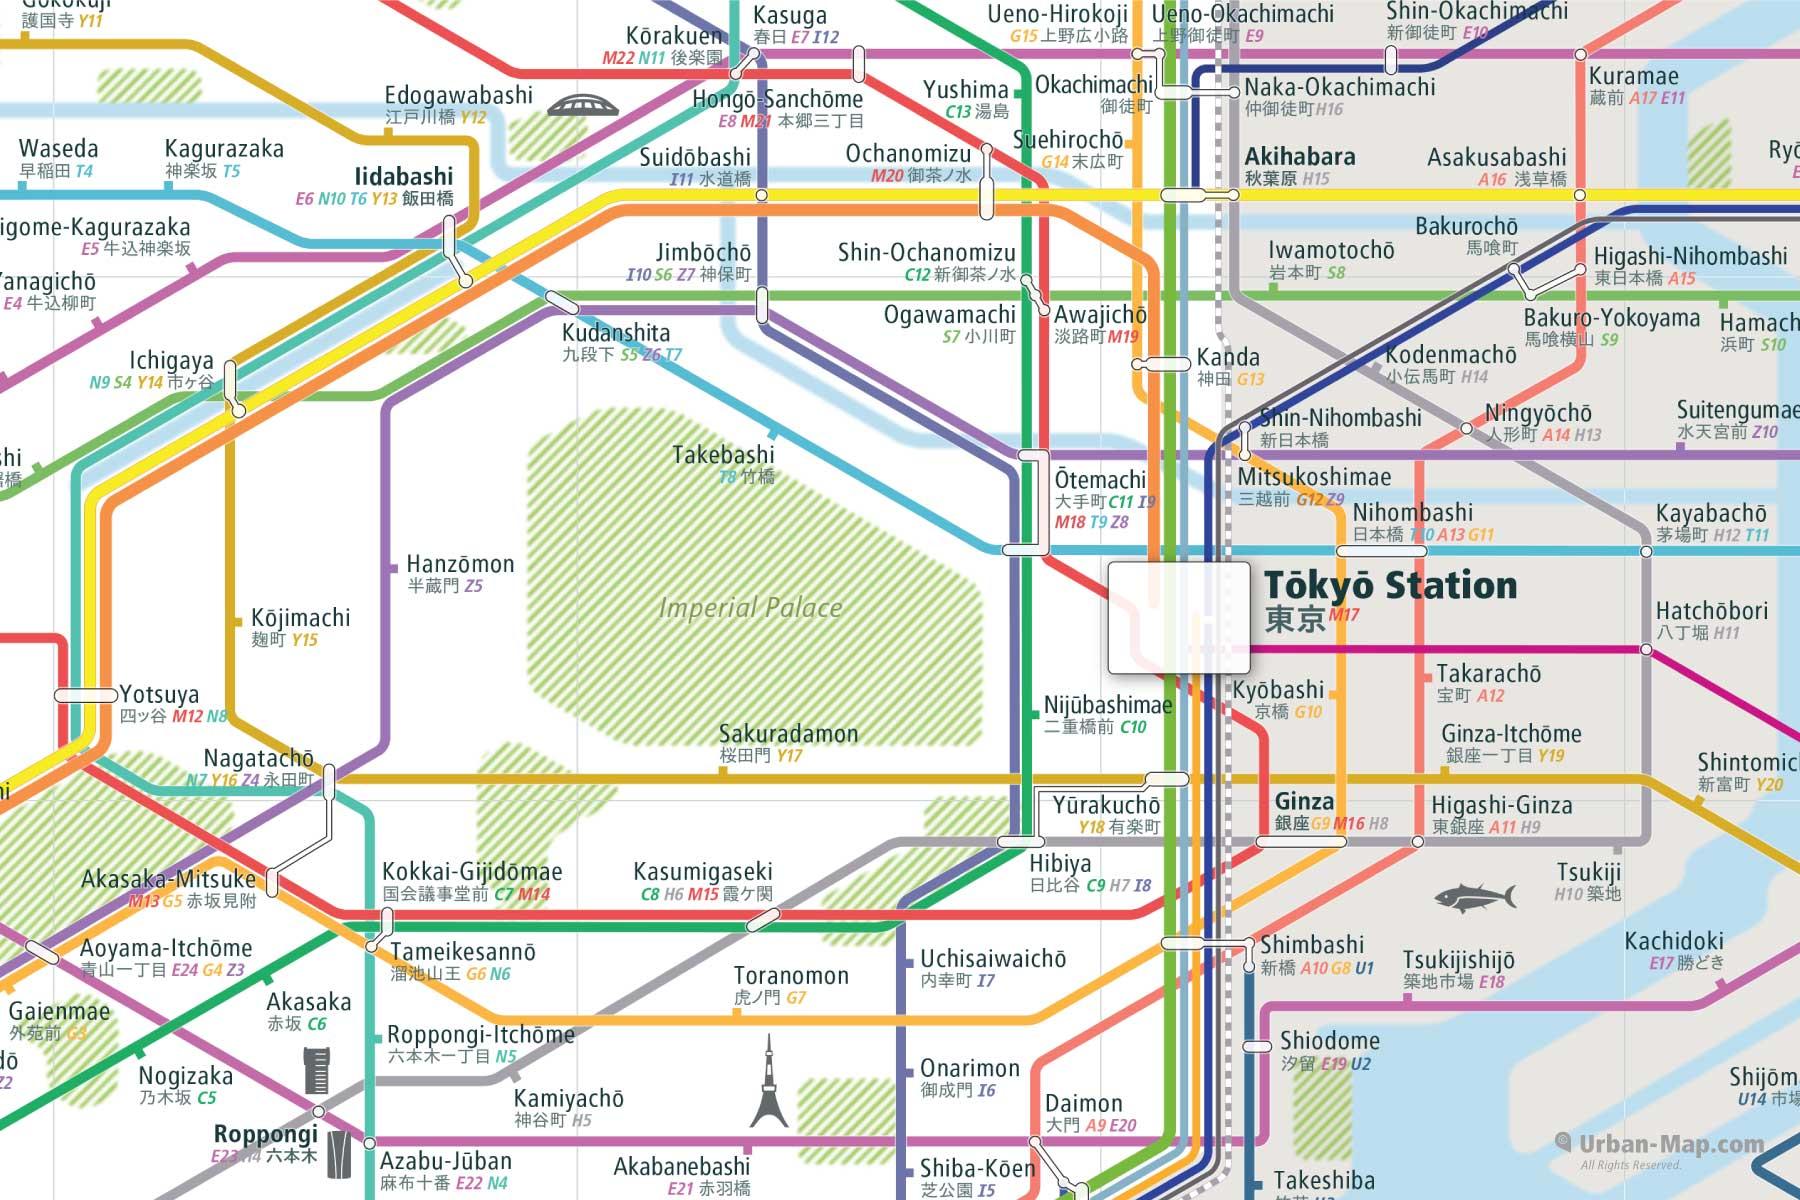 Tokyo City Rail Map shows the train and public transportation routes of JR East Japan Rail, Tokyo Metro, Toei Subway, Yokohama Municipal, Keikyu, Keio, Keisei, Odakyu, Seibu, Sotetsu, Tobu, Tokyu,Keiyō, Kawagoe, Saikyō, Rinkai, Shōnan-Shinjuku, Tokyo Monorail, and Airport Link -